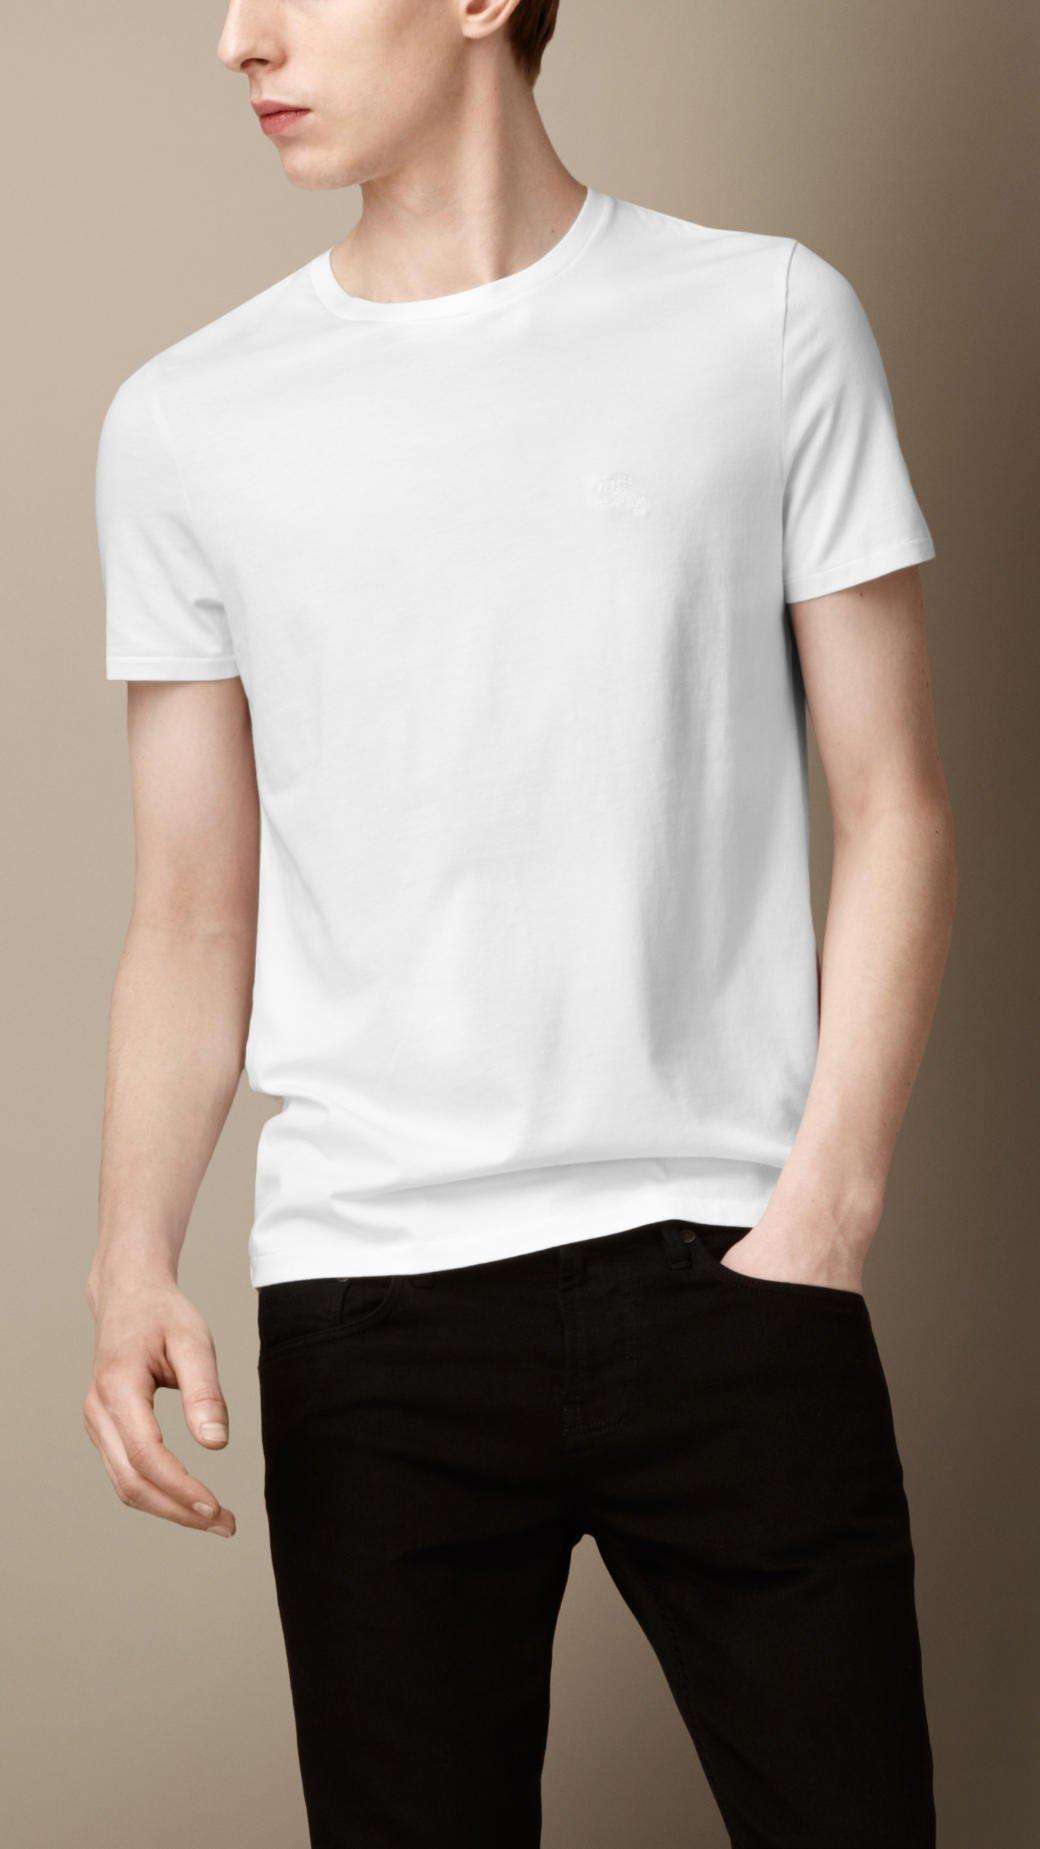 ca970b0e7 Burberry Liquid Soft Cotton Tshirt in White for Men - Lyst